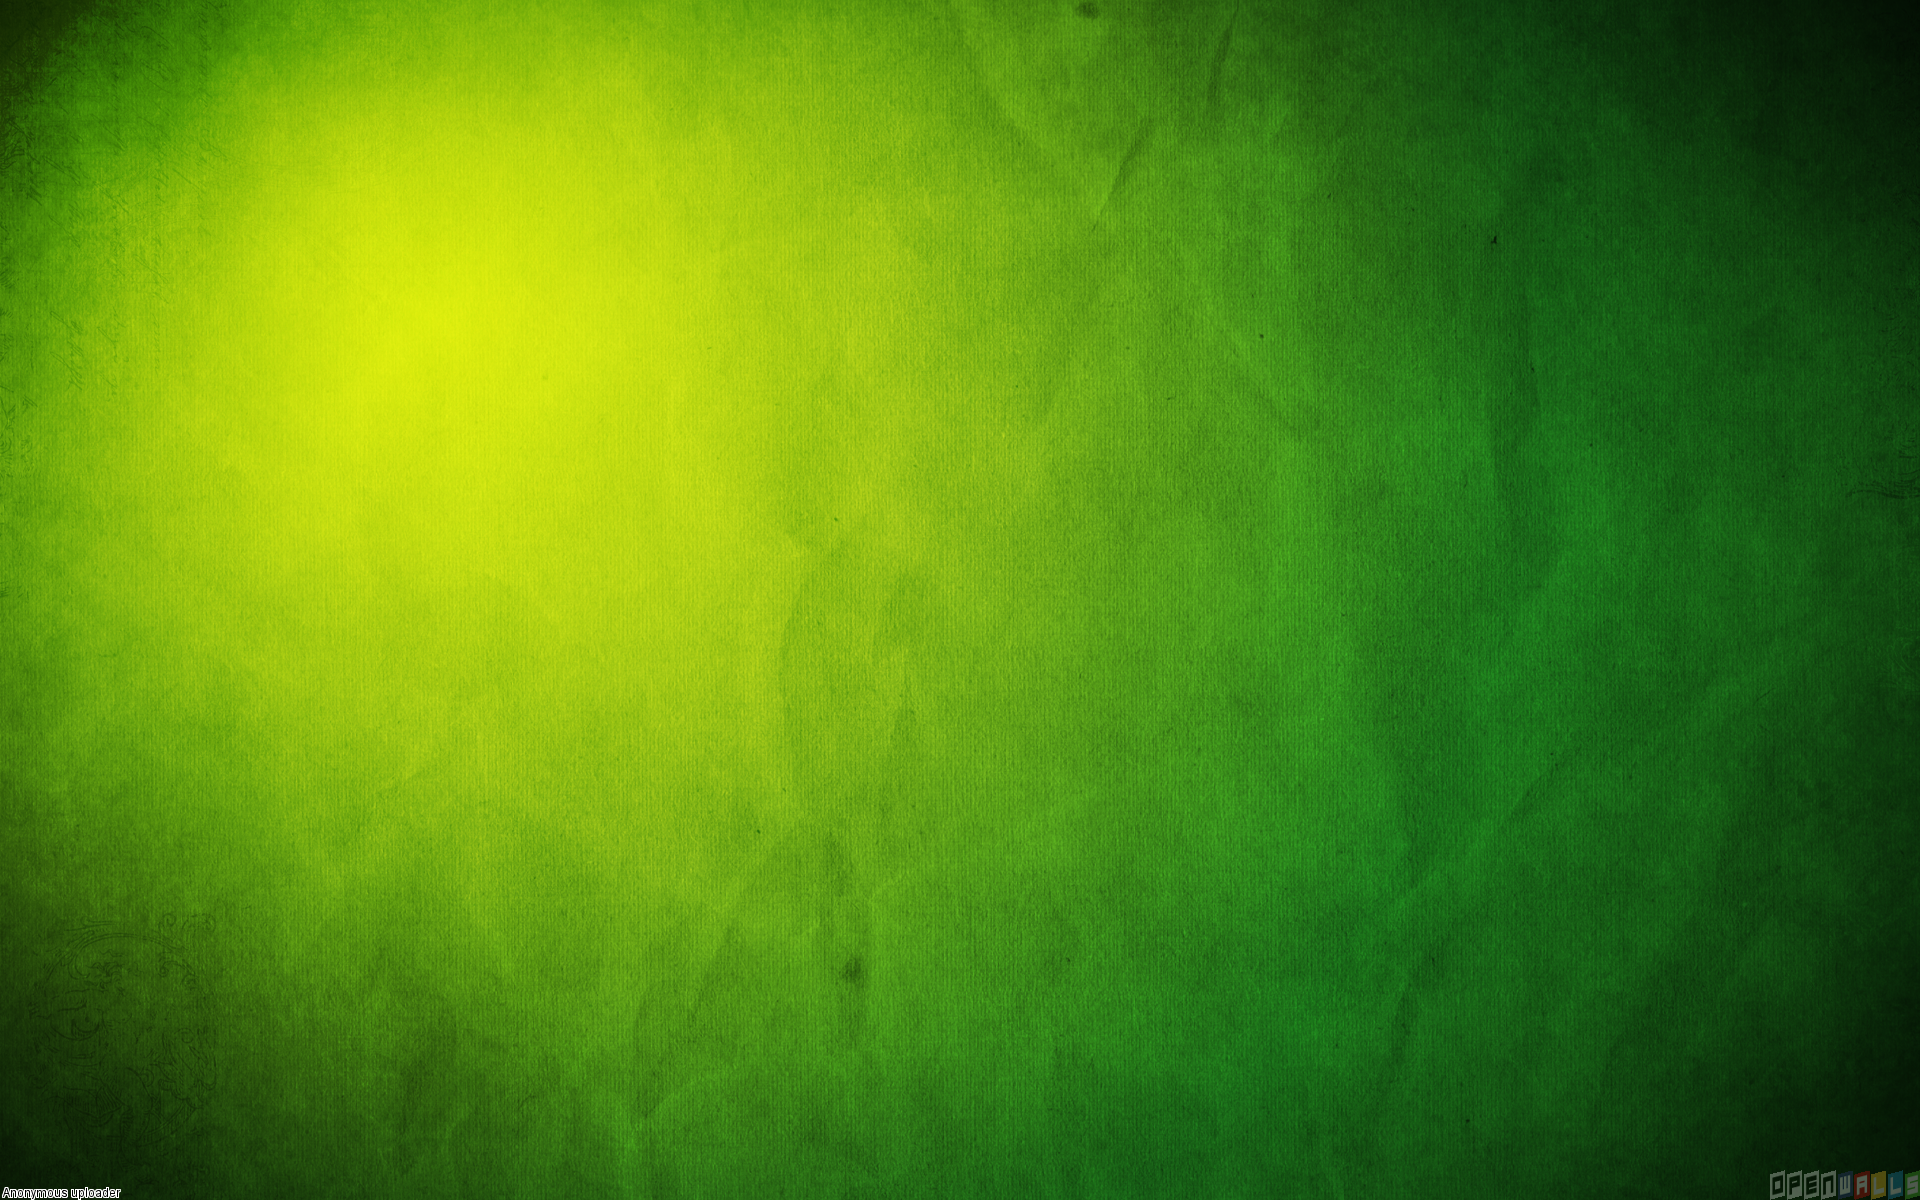 Green background wallpaper wallpapersafari for Green wallpaper for walls